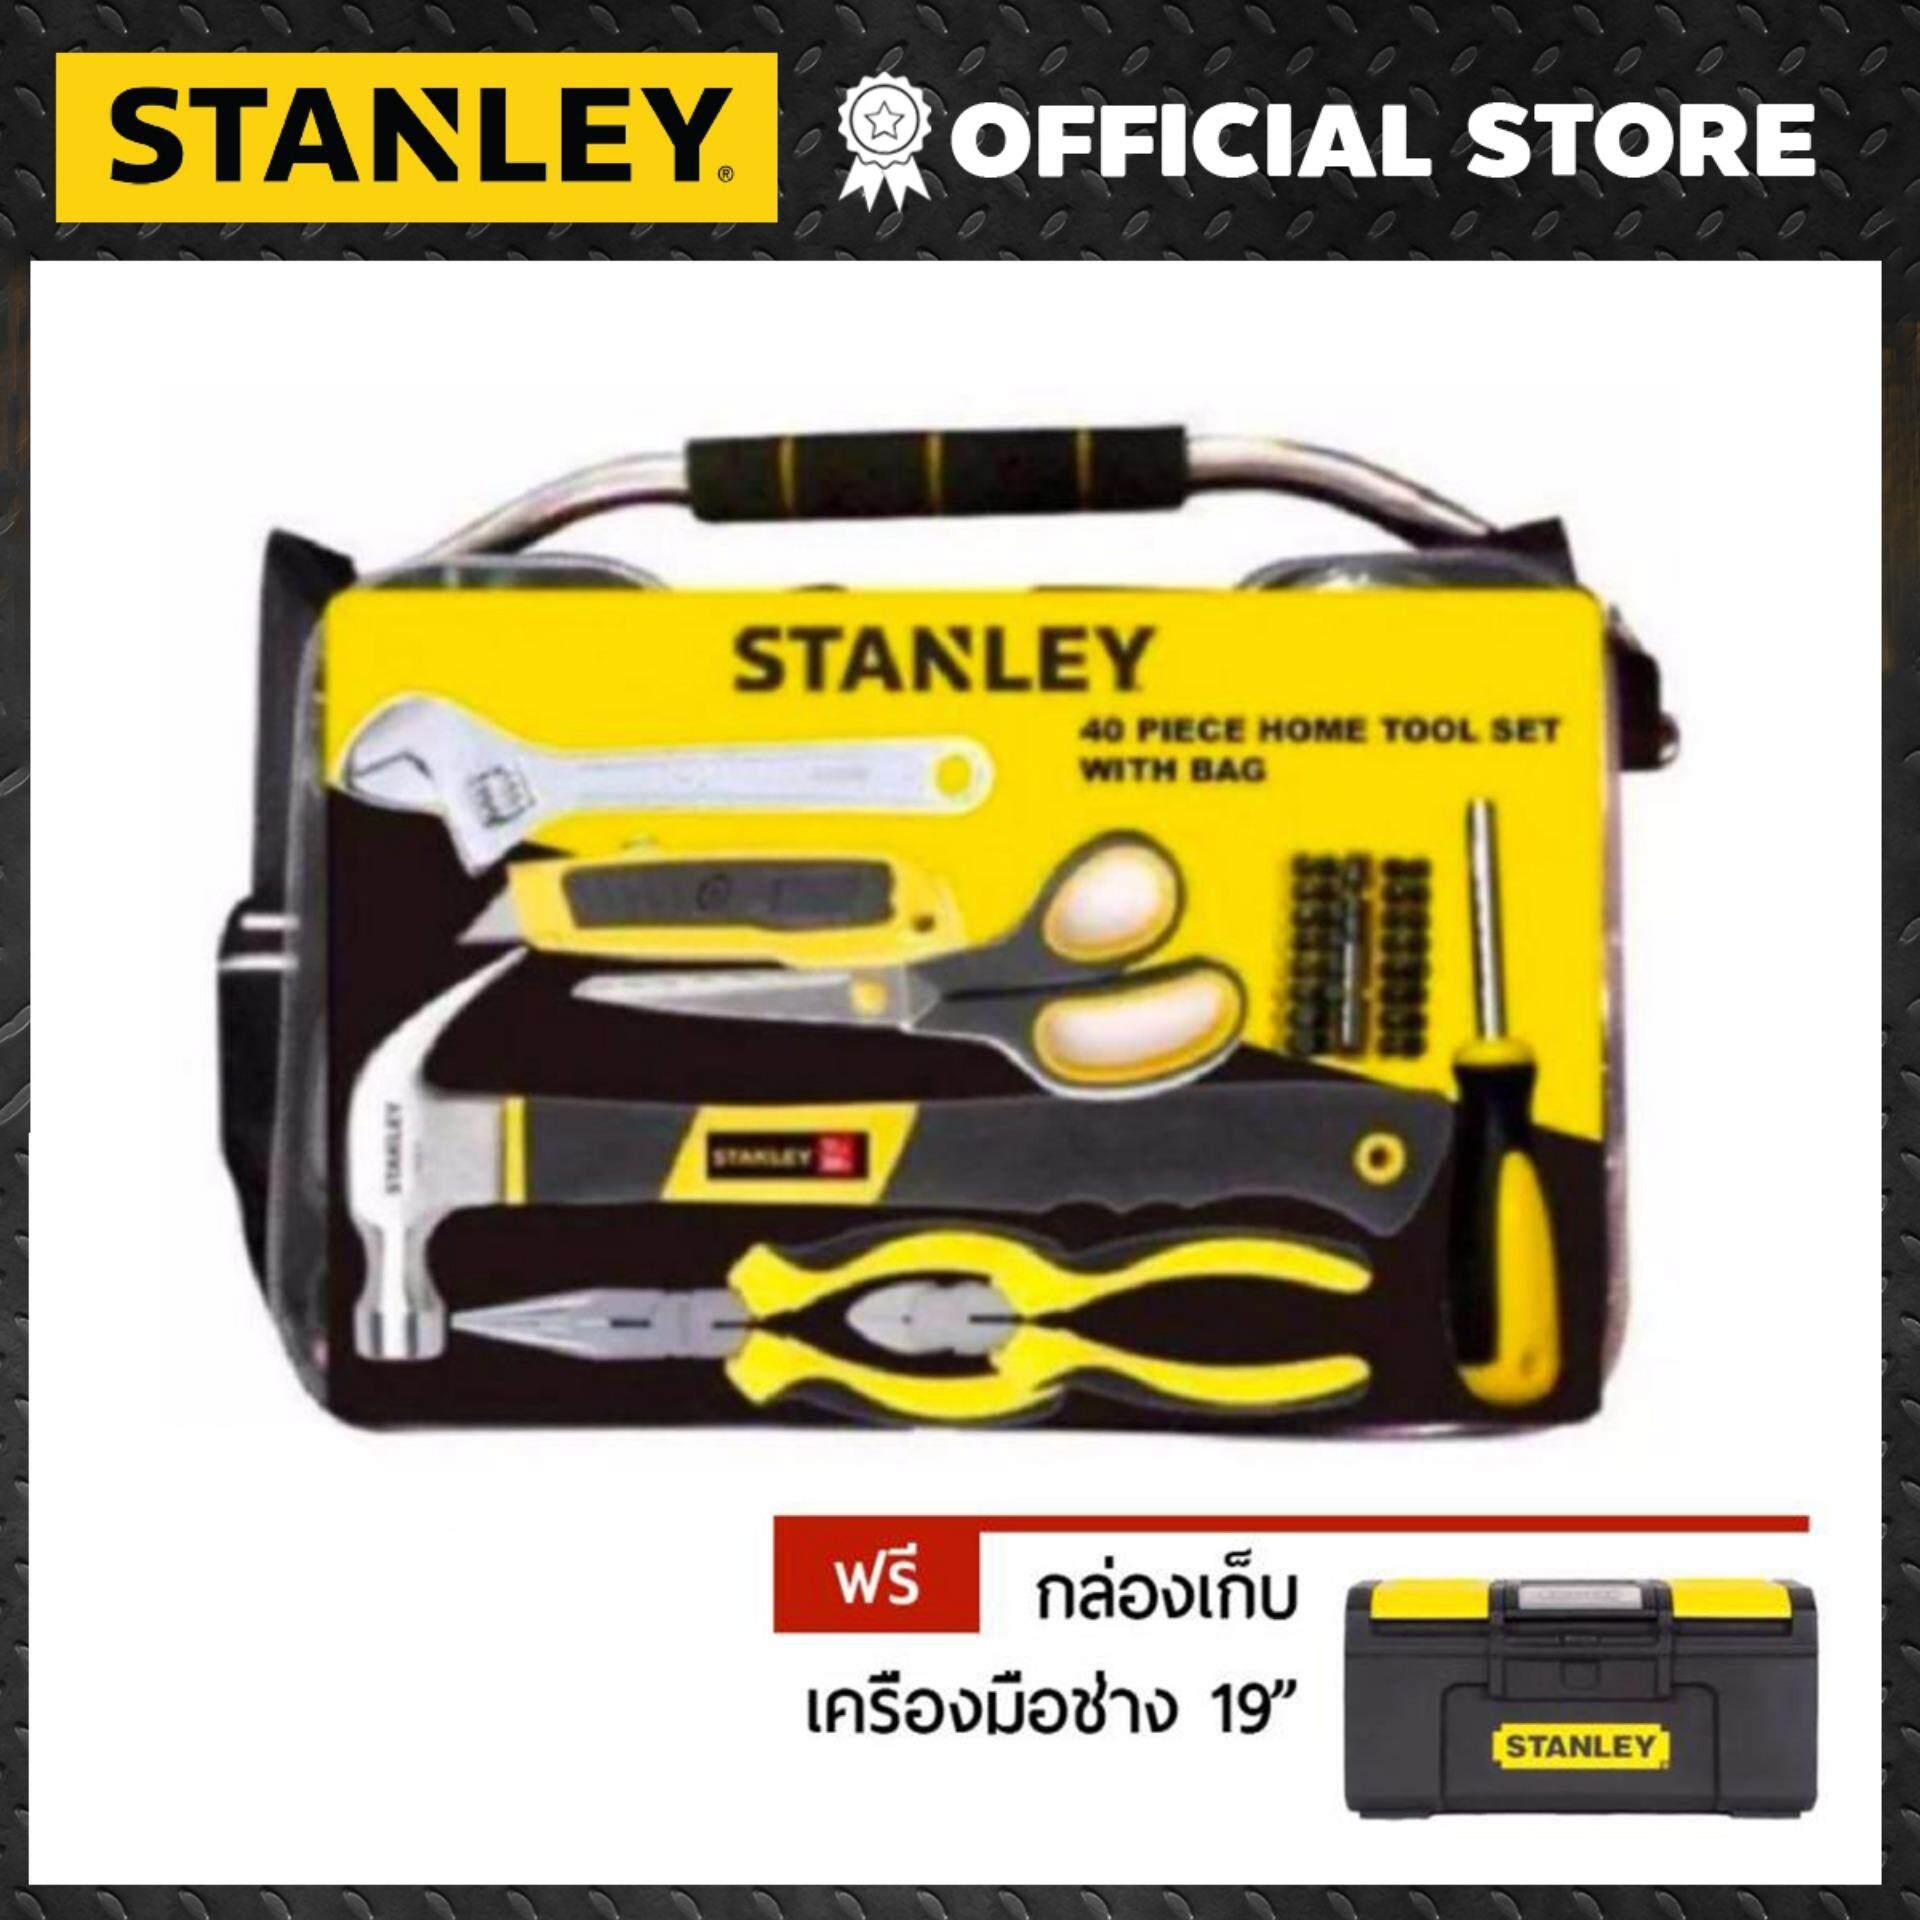 STANLEY STHT74978AR 40 PCS Home Tool Set พร้อมกล่องเก็บเครื่องมือช่าง